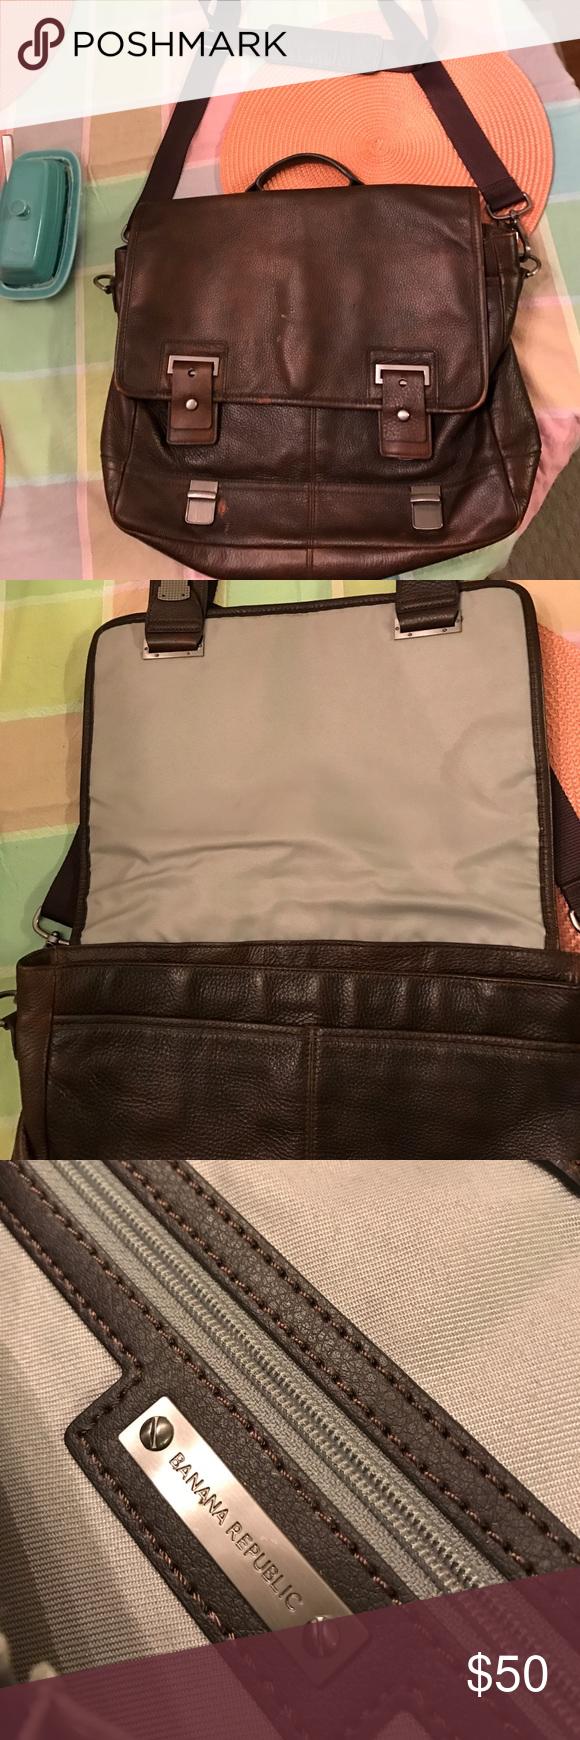 Men s Banana Republic messenger bag Nice brown messenger bag! Has some wear  to it but still in good shape! Banana Republic Bags Laptop Bags 9c48bf13ae